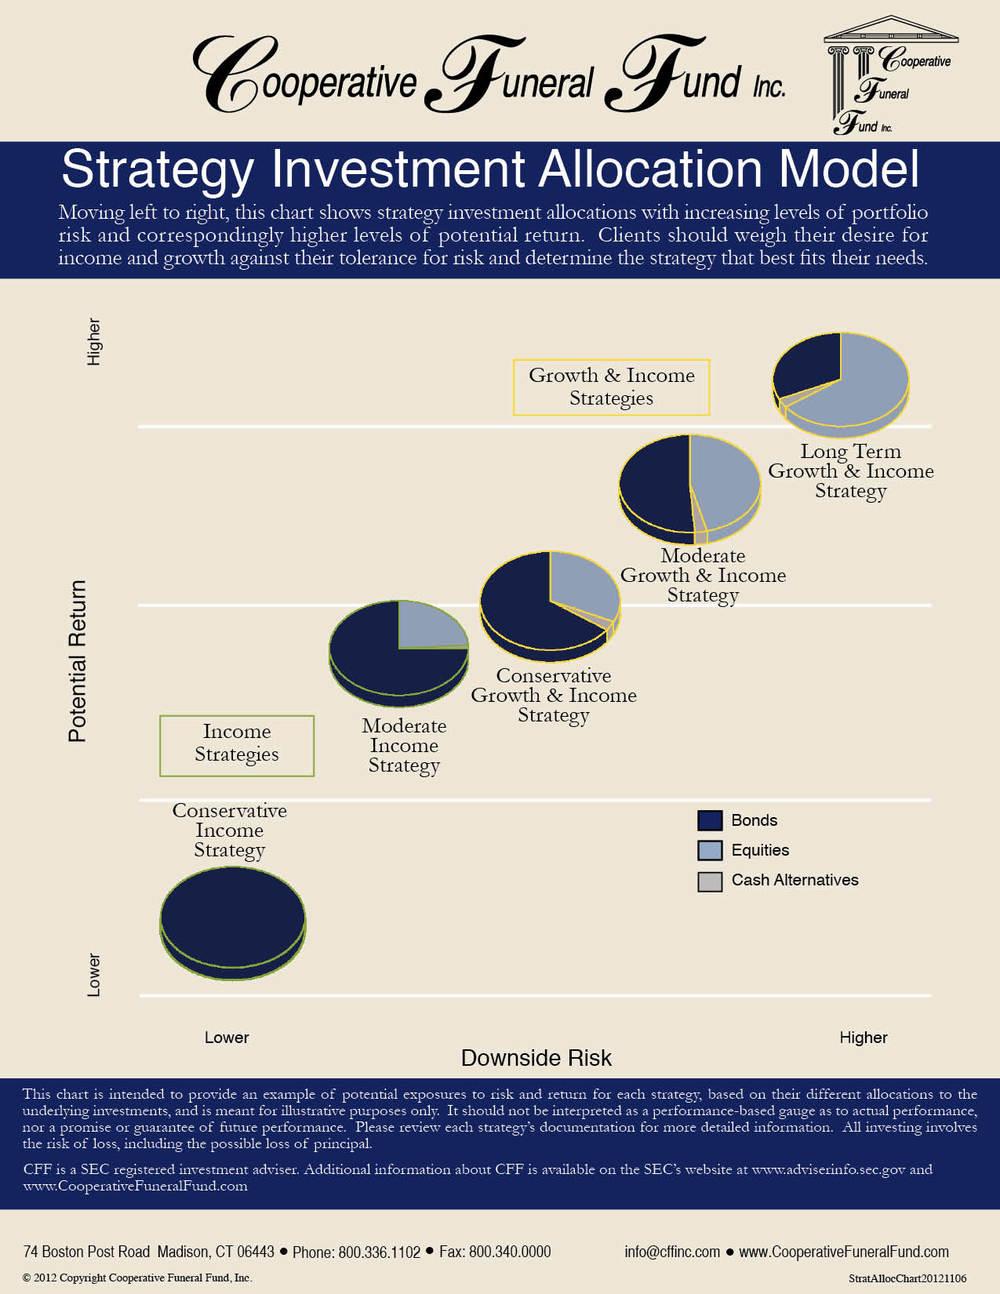 strategyallocationchart-wch-20121106.jpg